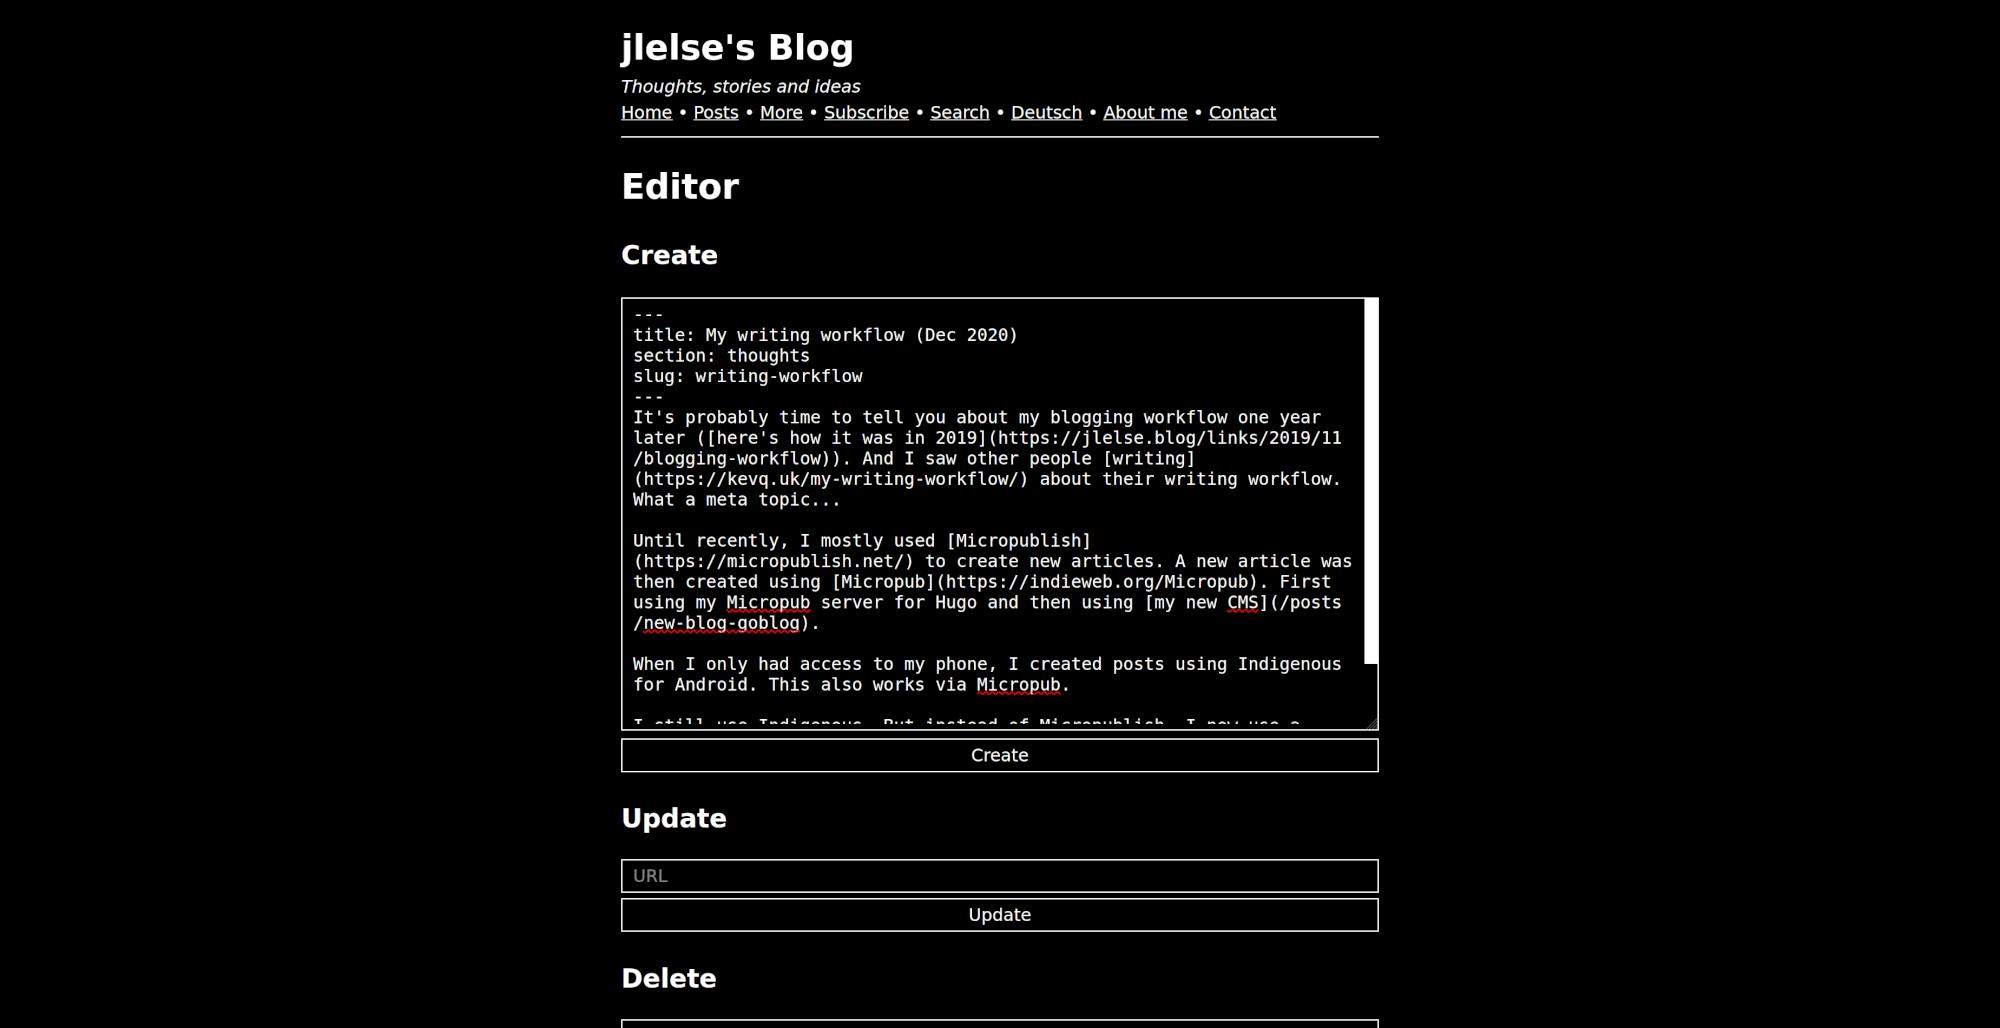 My blog editor